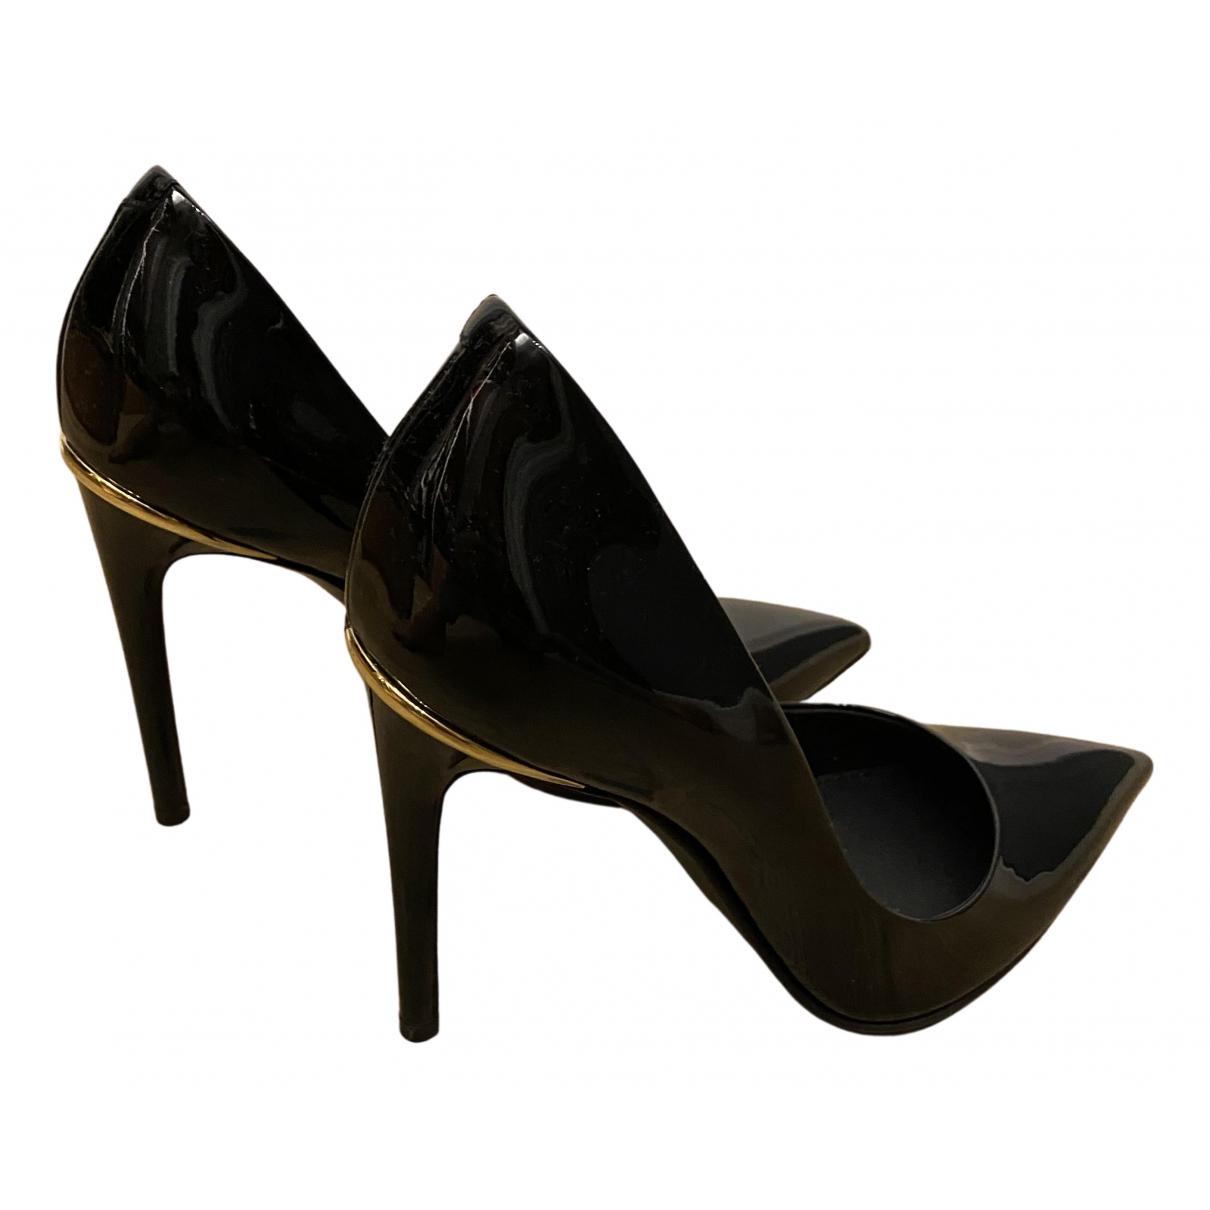 Louis Vuitton N Black Leather Heels for Women 36 EU